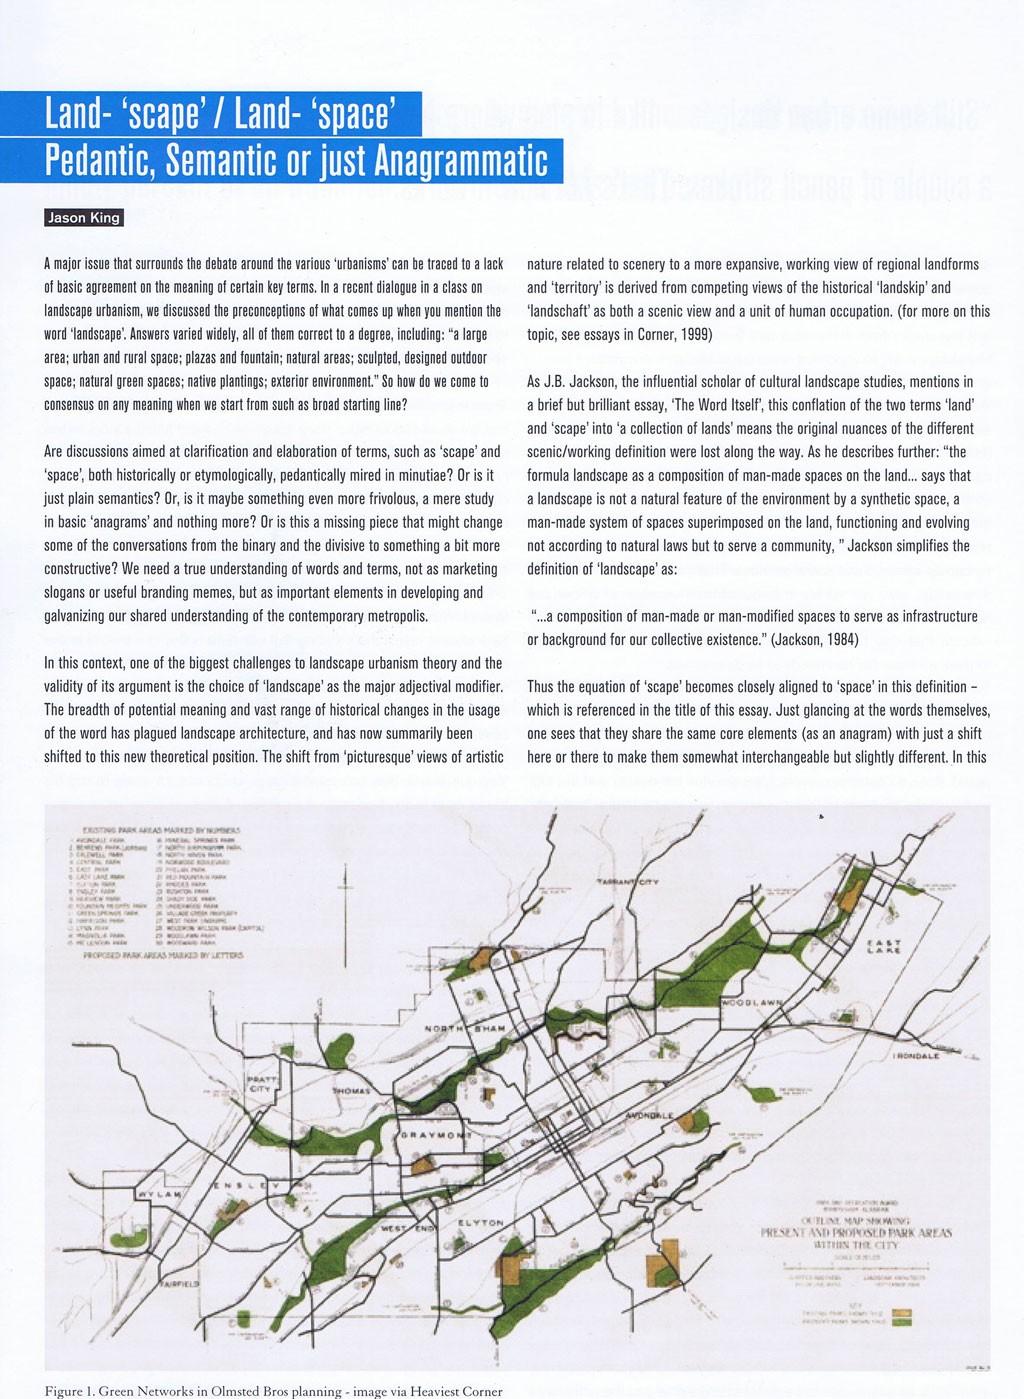 006 Landscape Architecture Essay Atlantis Web Stunning Argumentative Topics Large